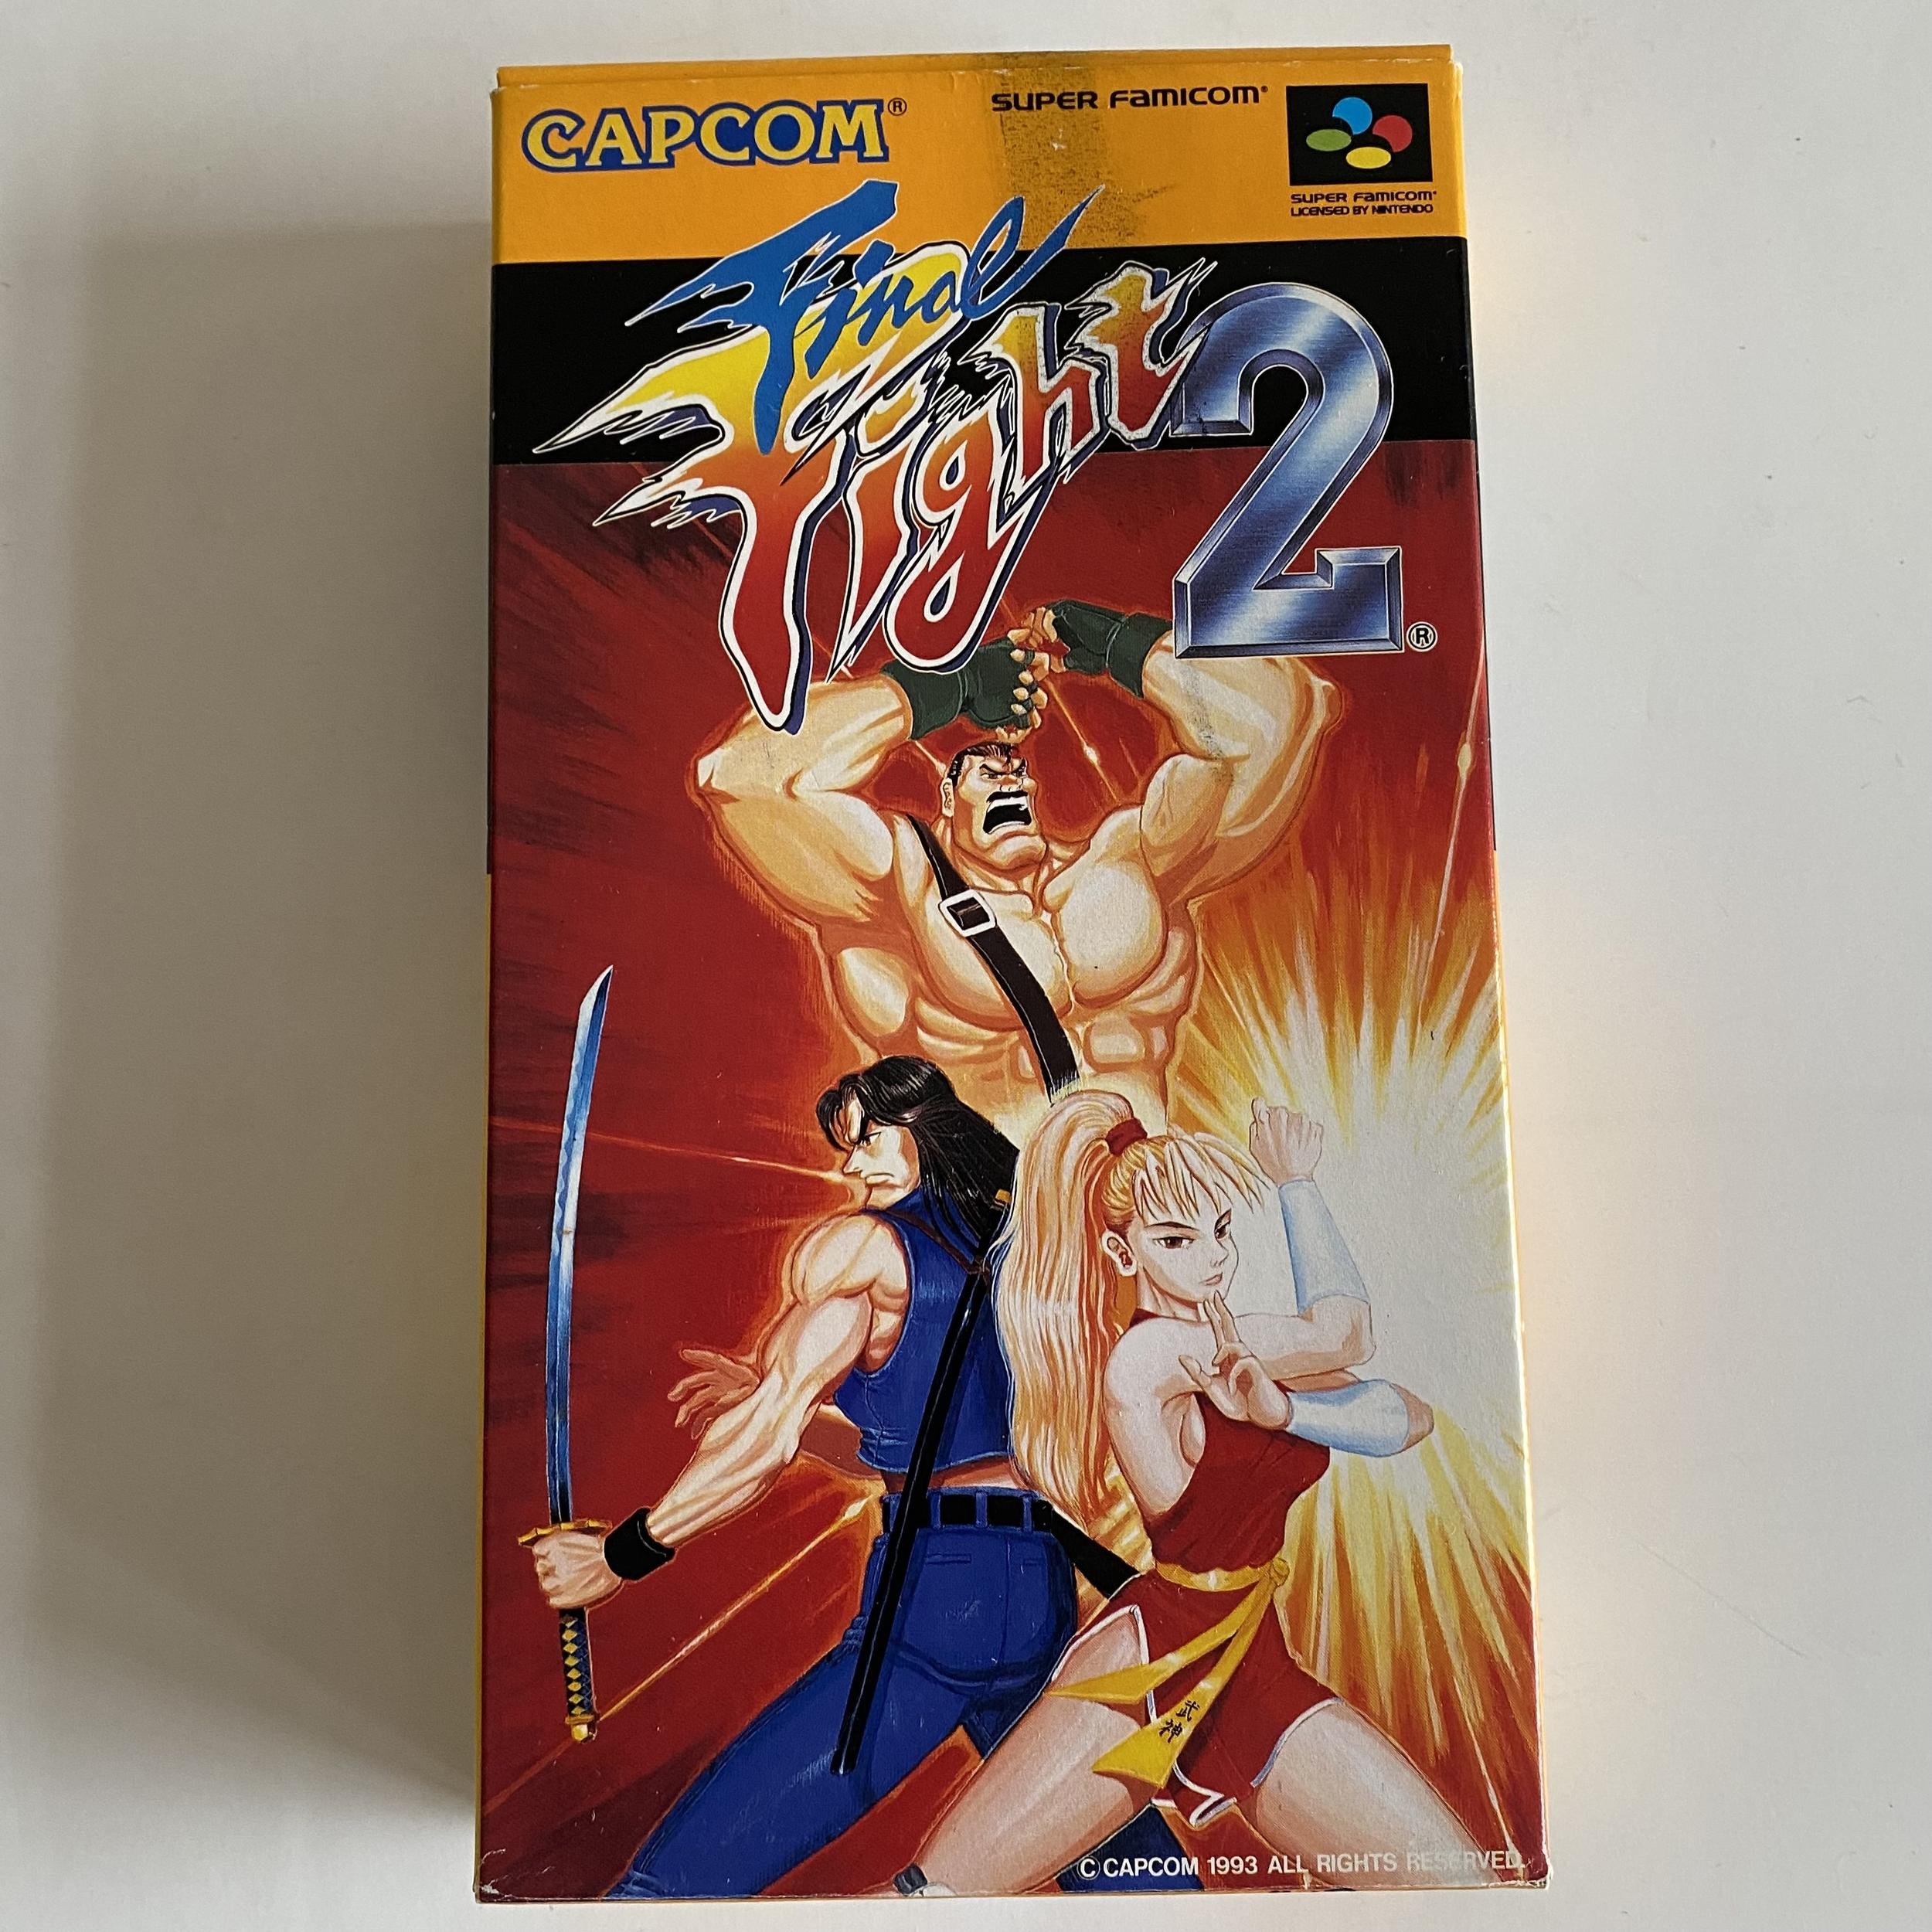 Final Fight 2 - Super Famicom